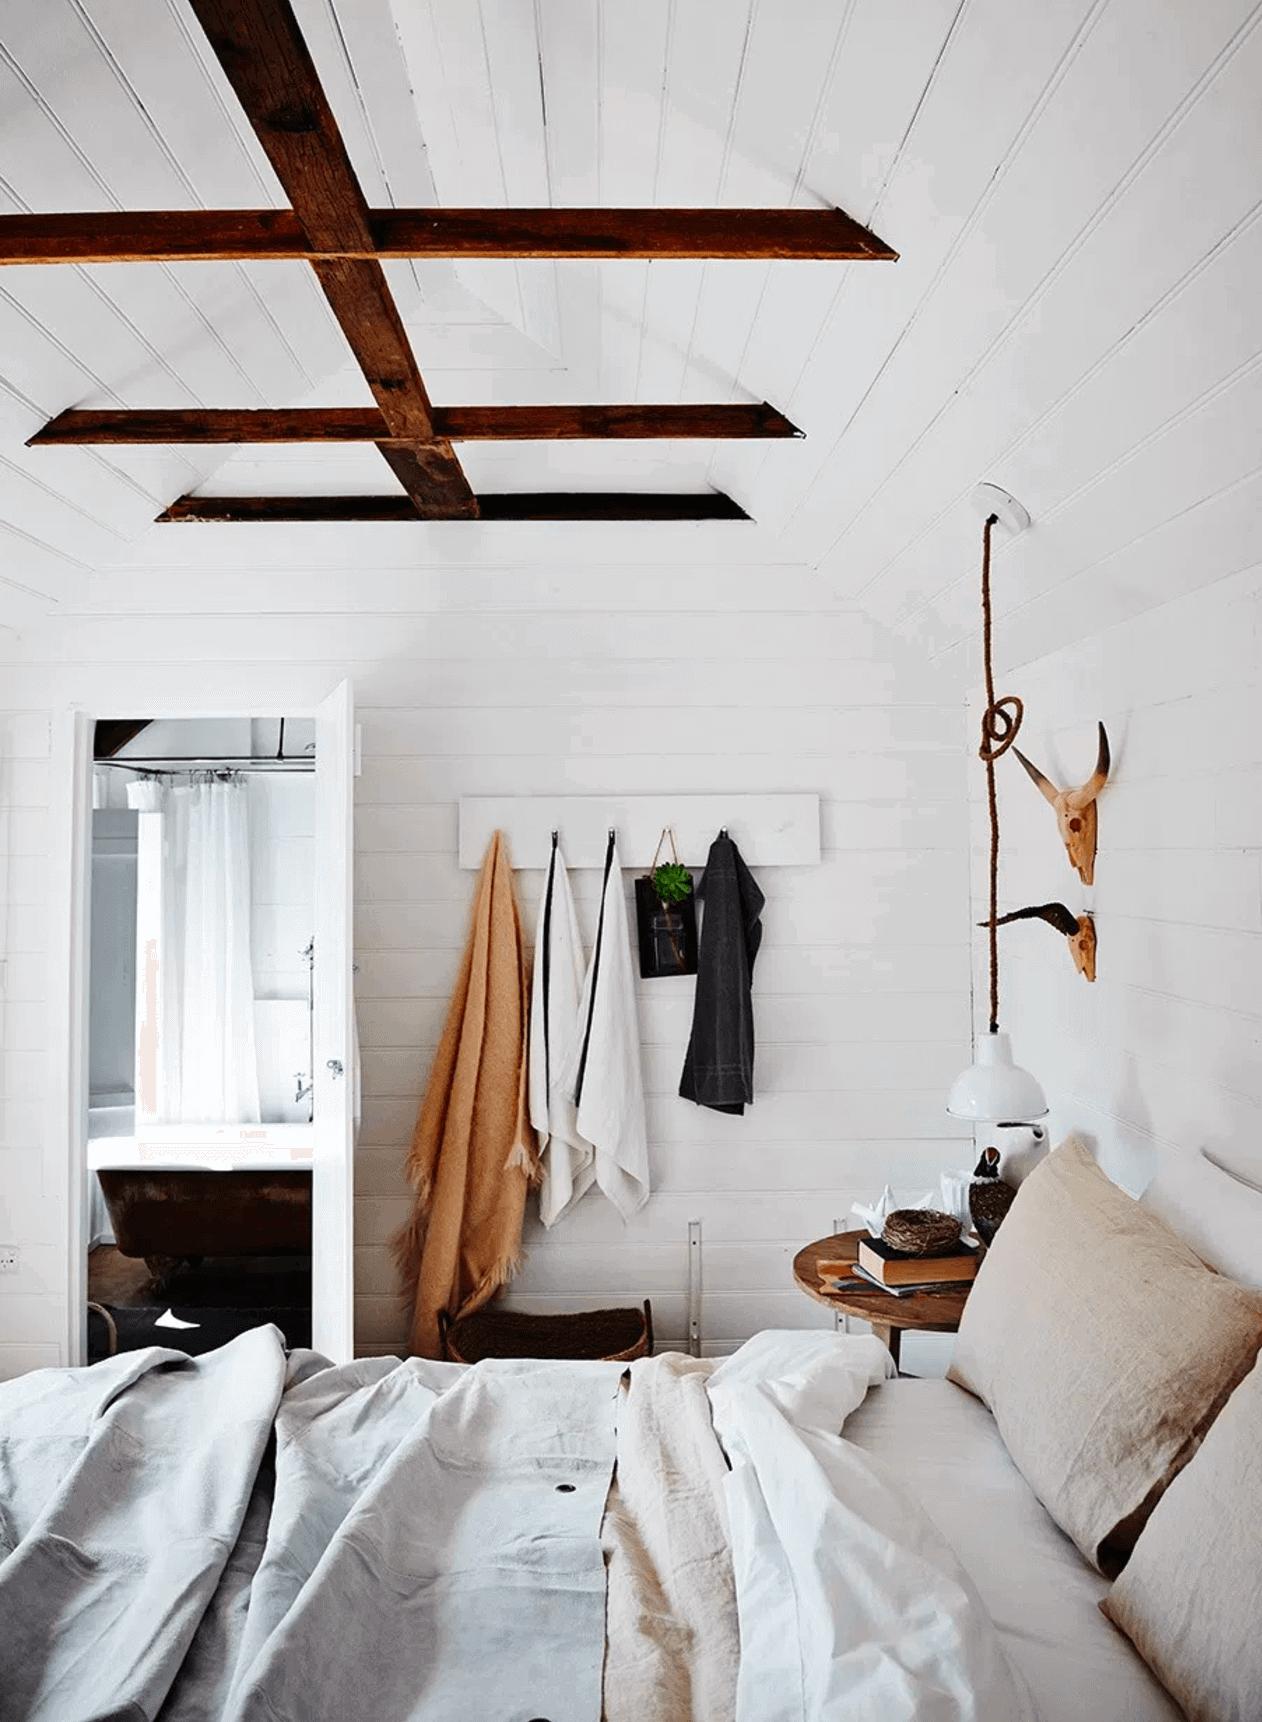 Brass HOOK Clothes Robe towel Shower Bathroom bedroom accessories